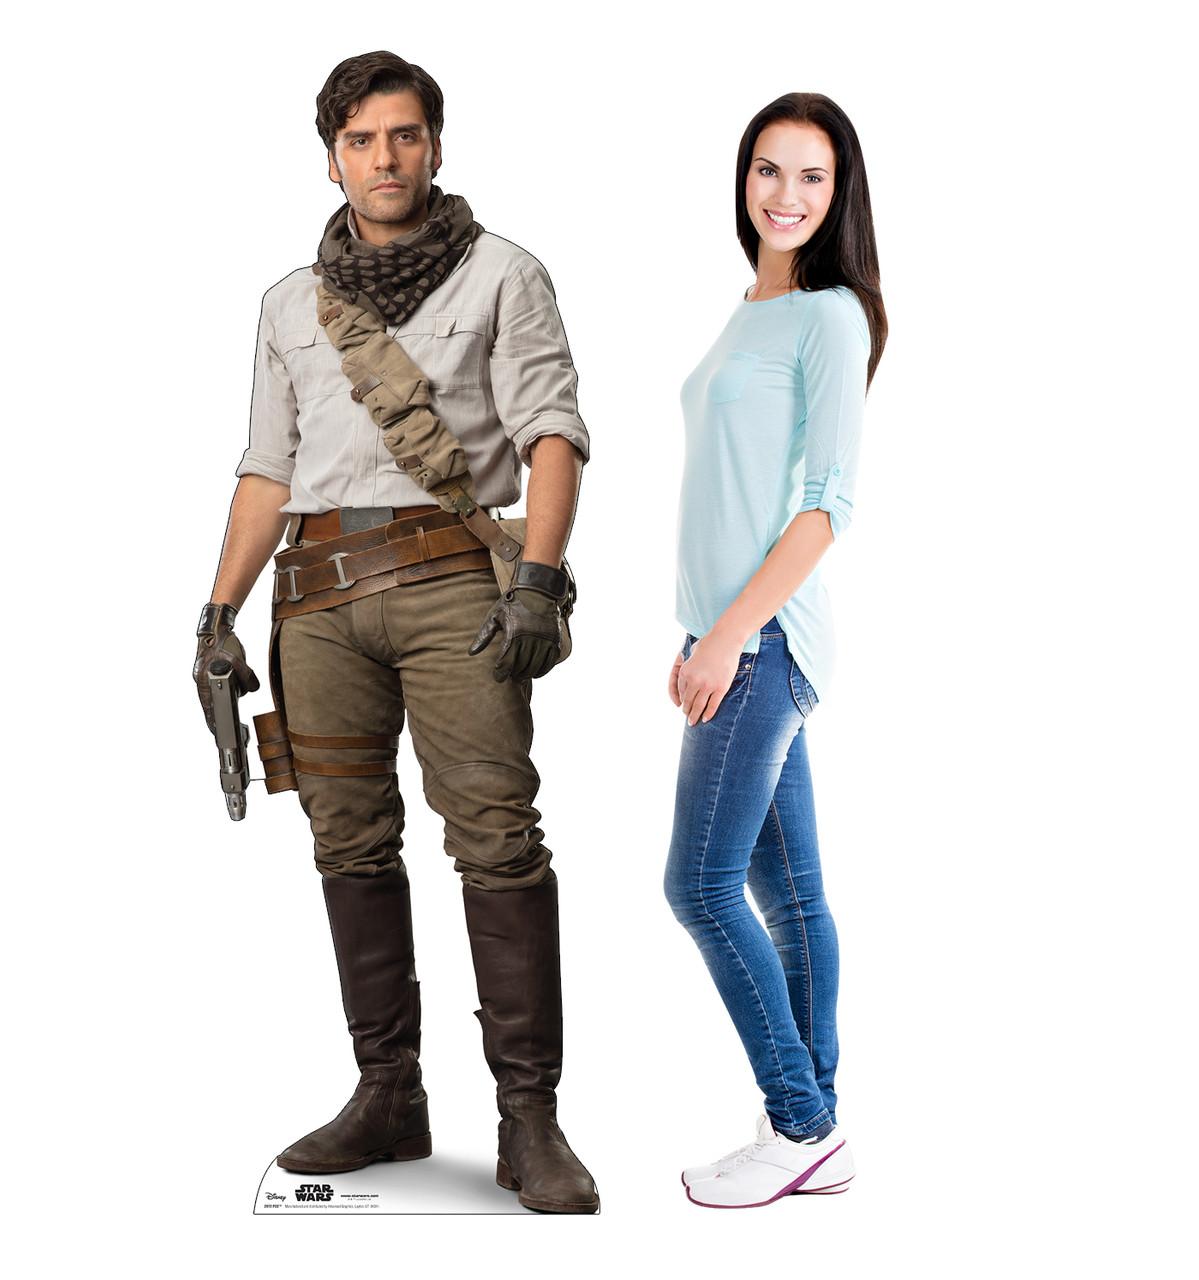 Life-size cardboard standee of Poe™ (Star Wars IX) with model.